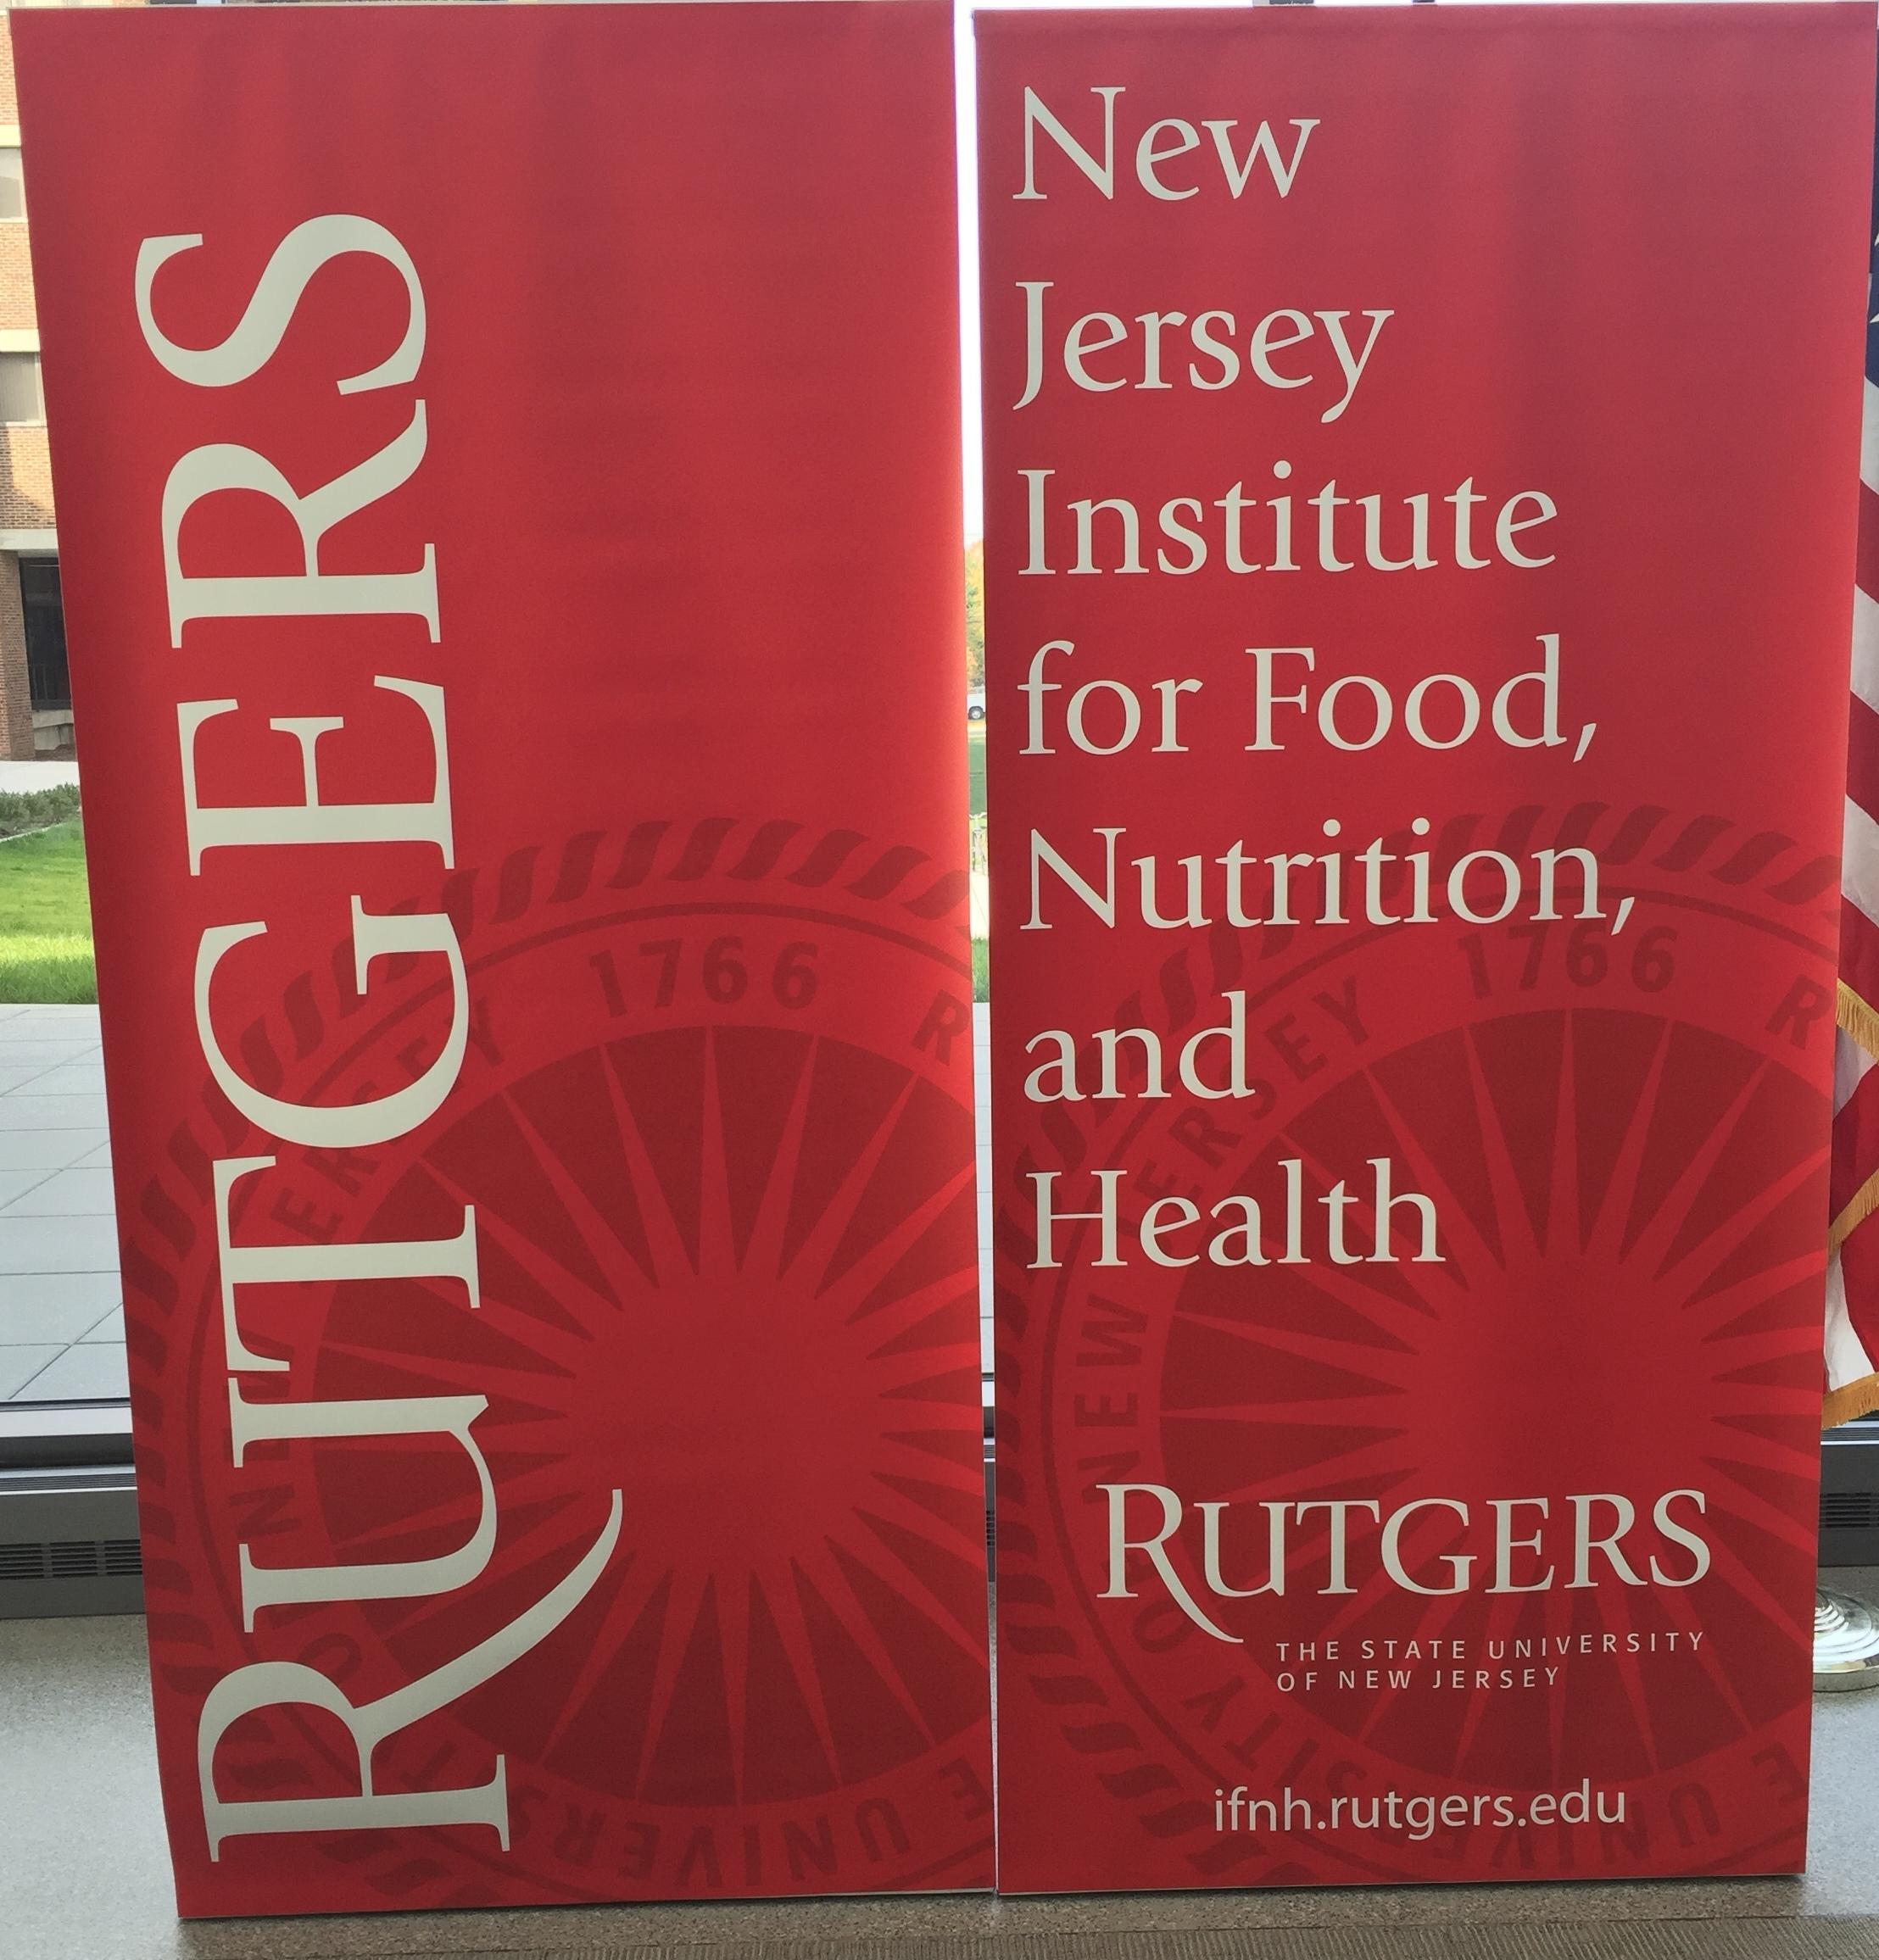 9e35d4e8218418b70238_IFNH_Rutgers_Banners.jpg